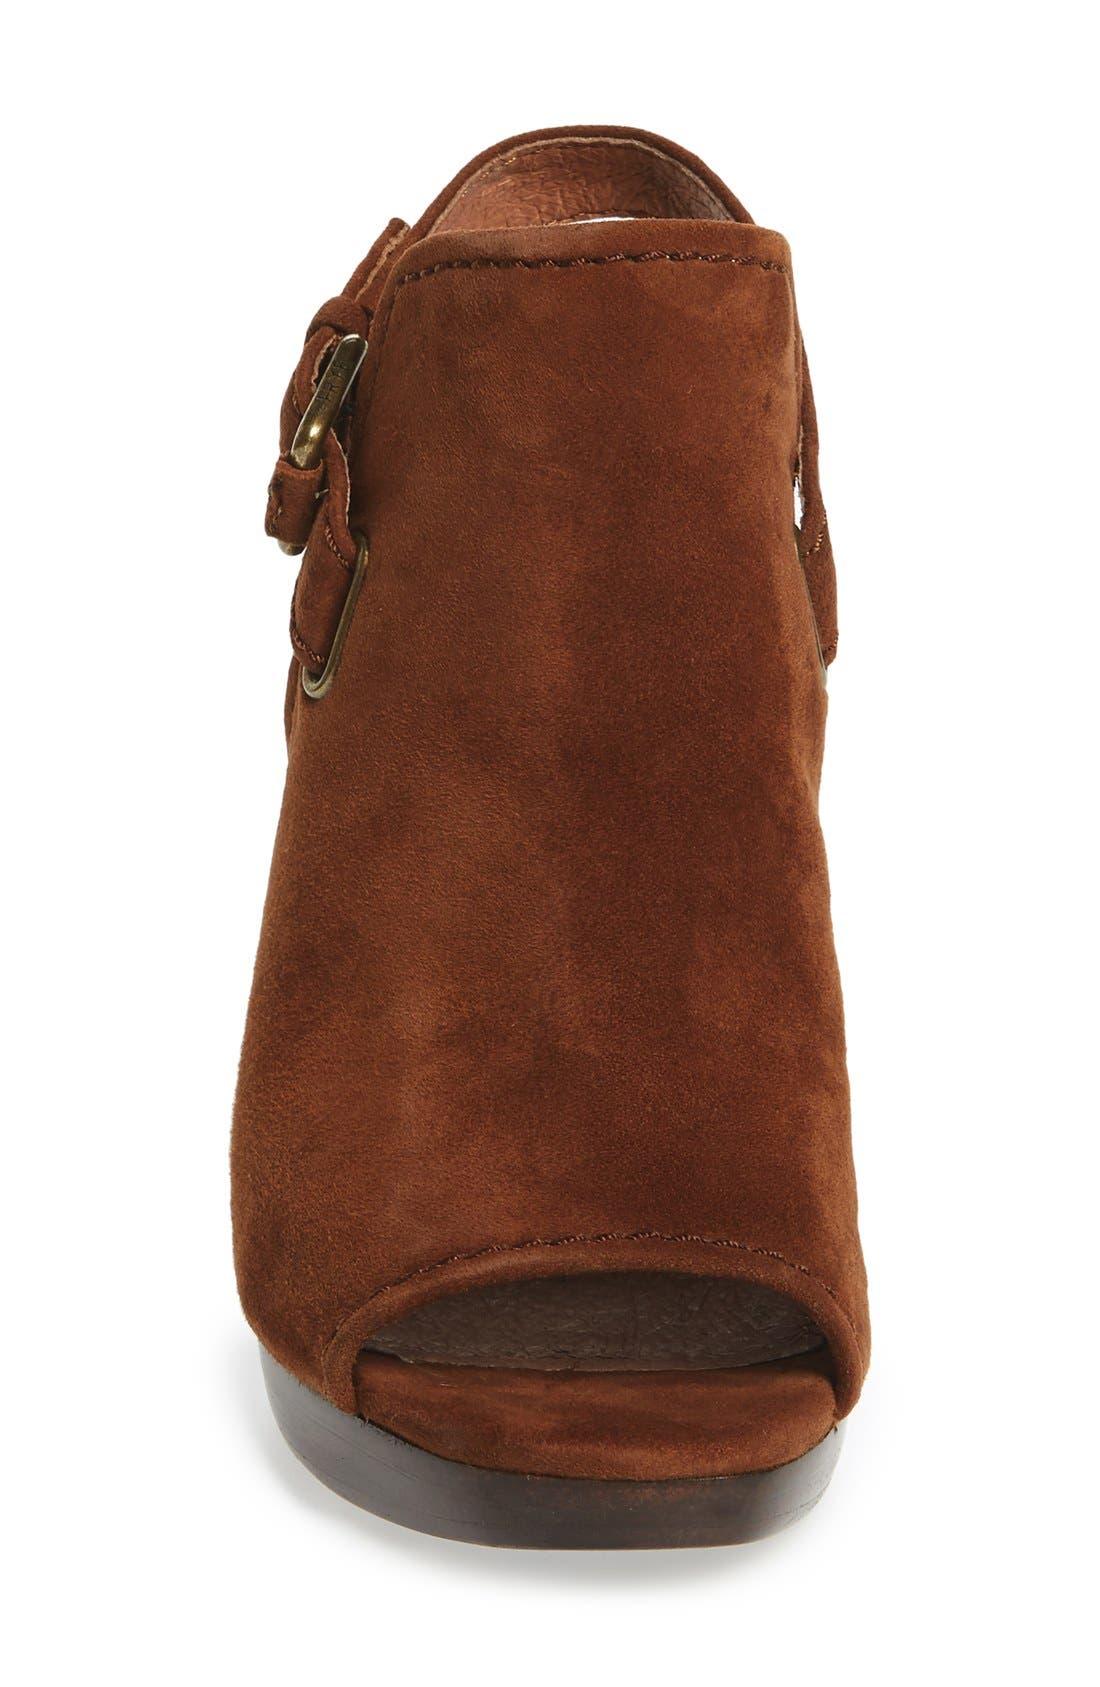 Alternate Image 3  - Frye 'Karissa Shield' Sandal (Women)